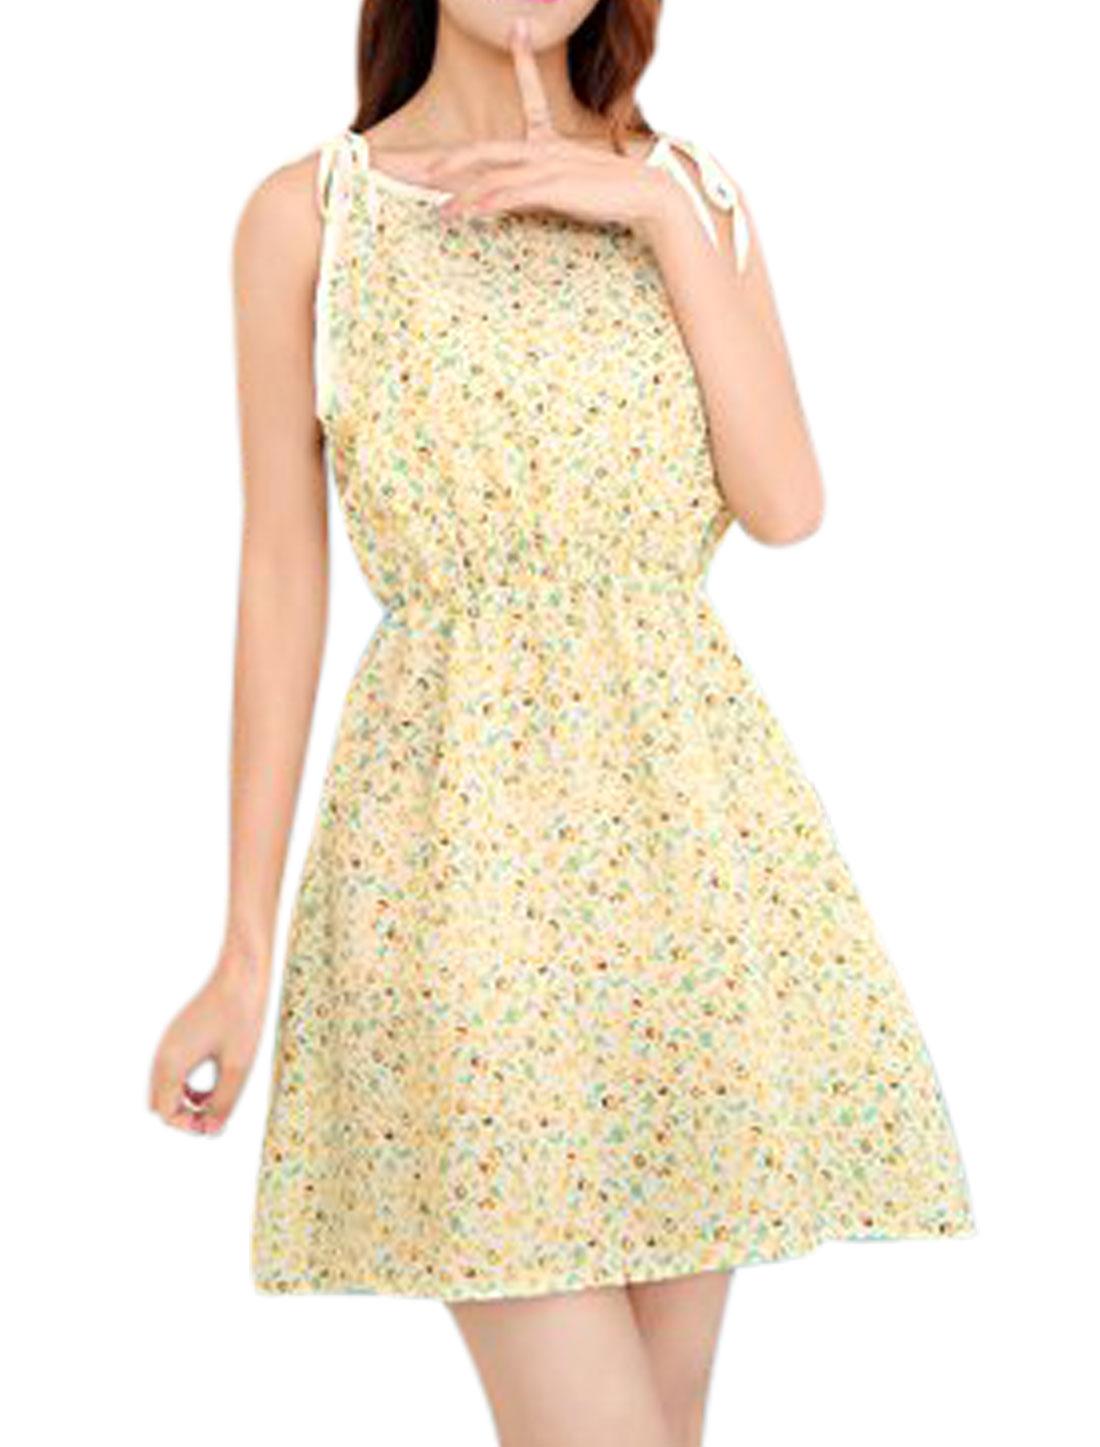 Women Self Tie Straps Round Neck Sleeveless Elastic Waist Tea Dress Beige XS